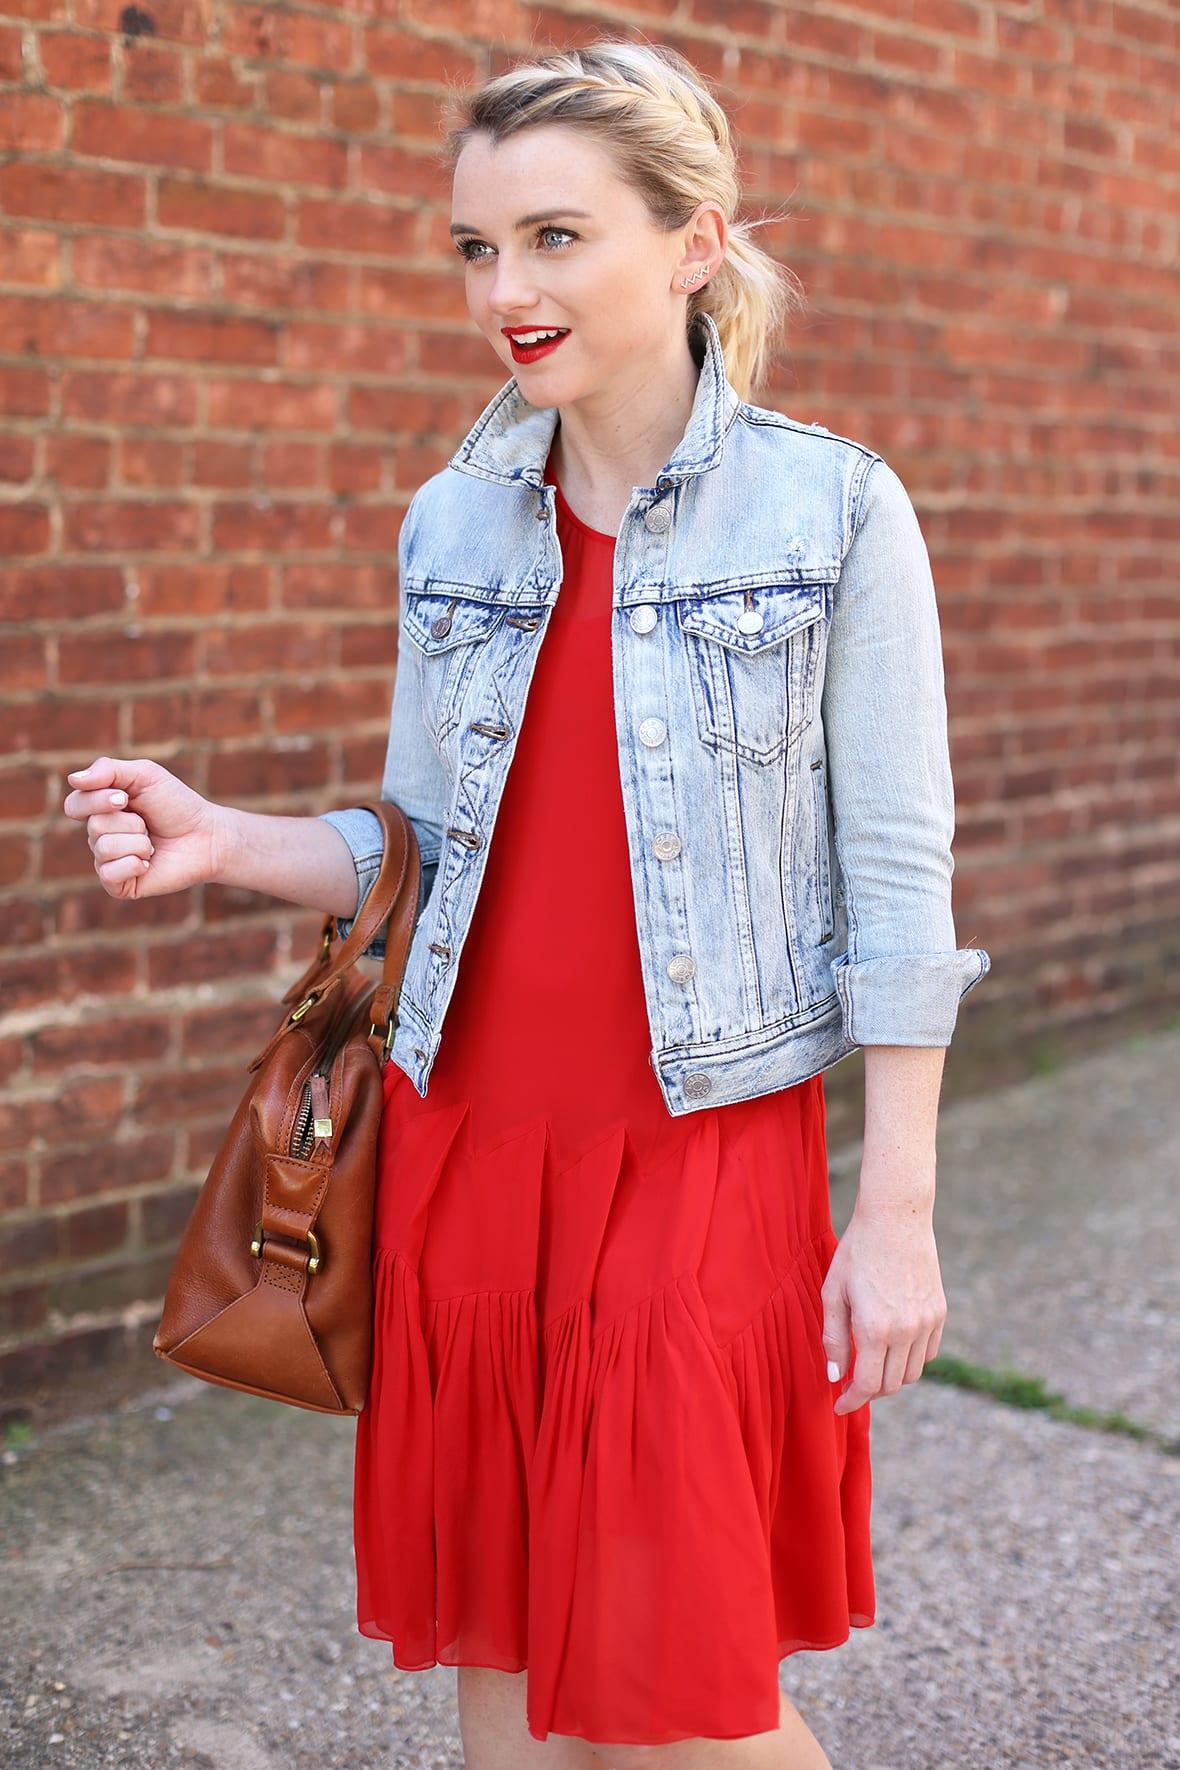 Red Dress And Denim Jacket For Summer Poor Little It Girl